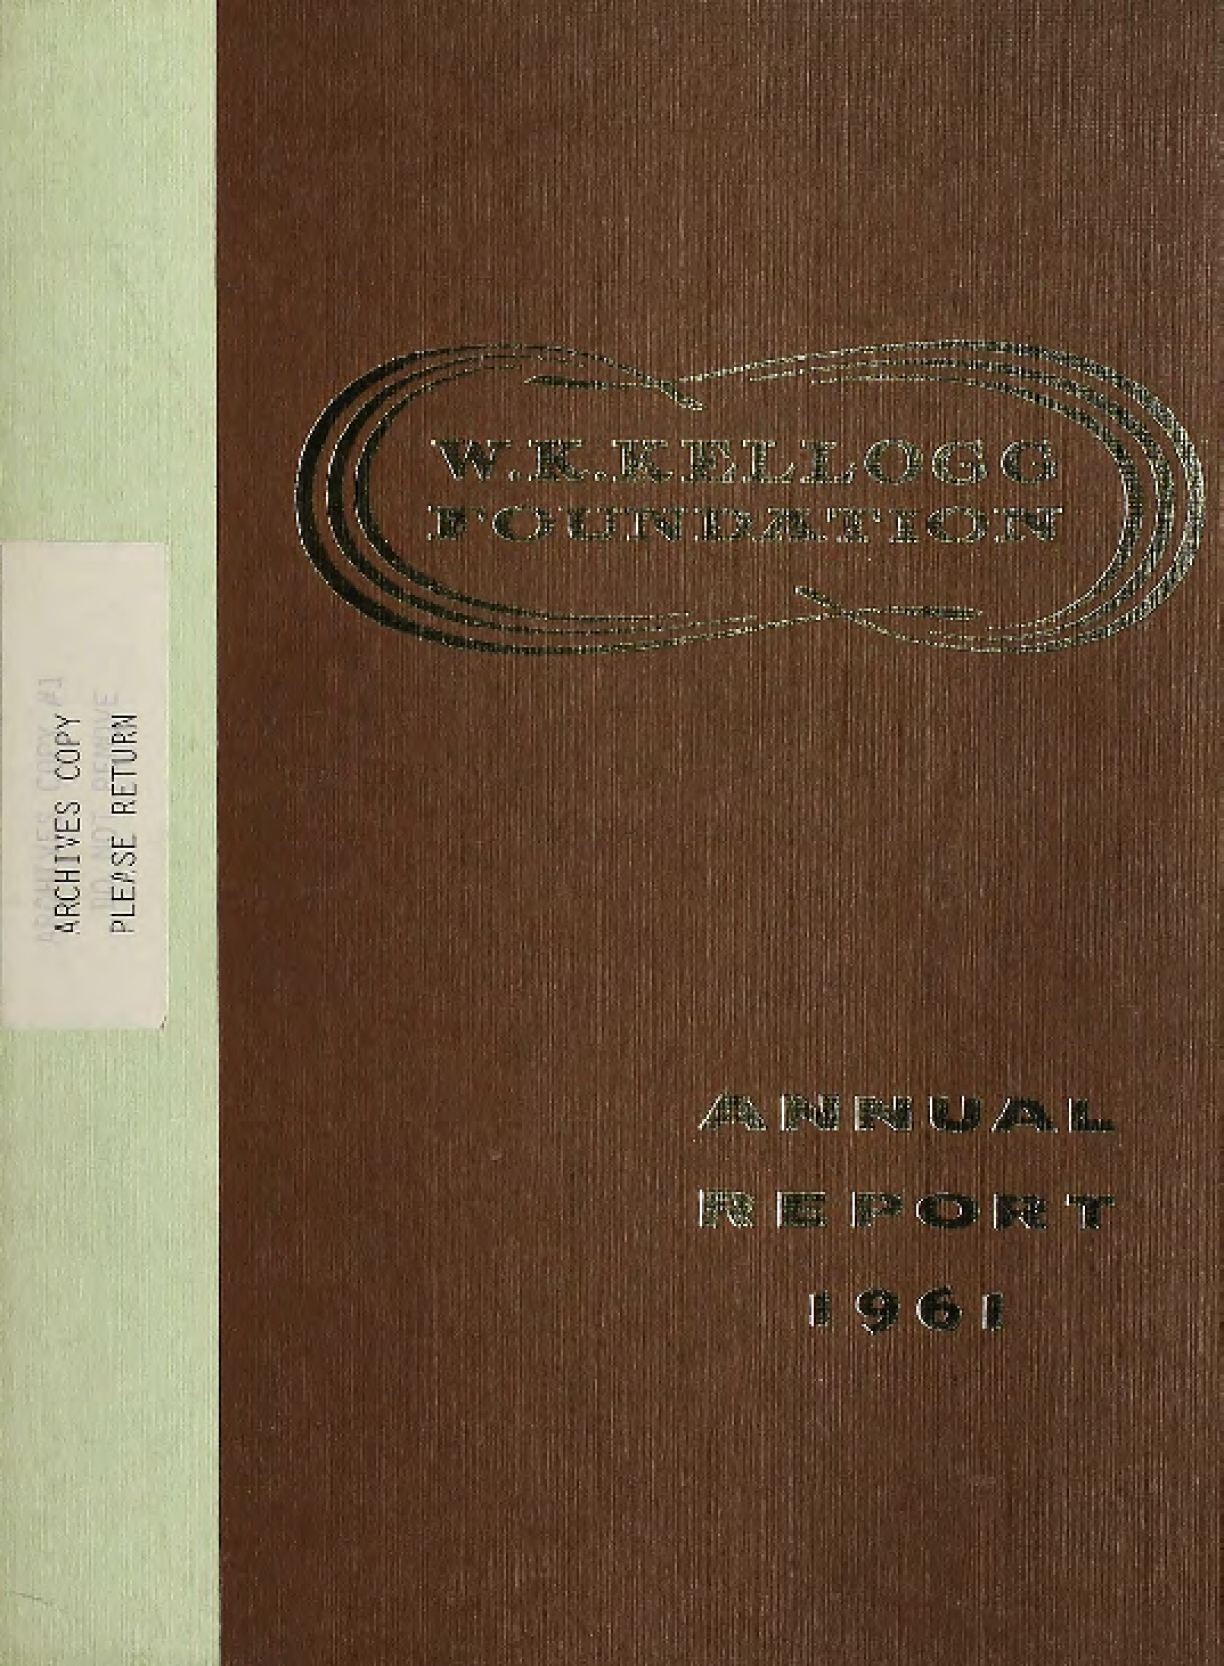 1961 W.K. Kellogg Foundation Annual Report